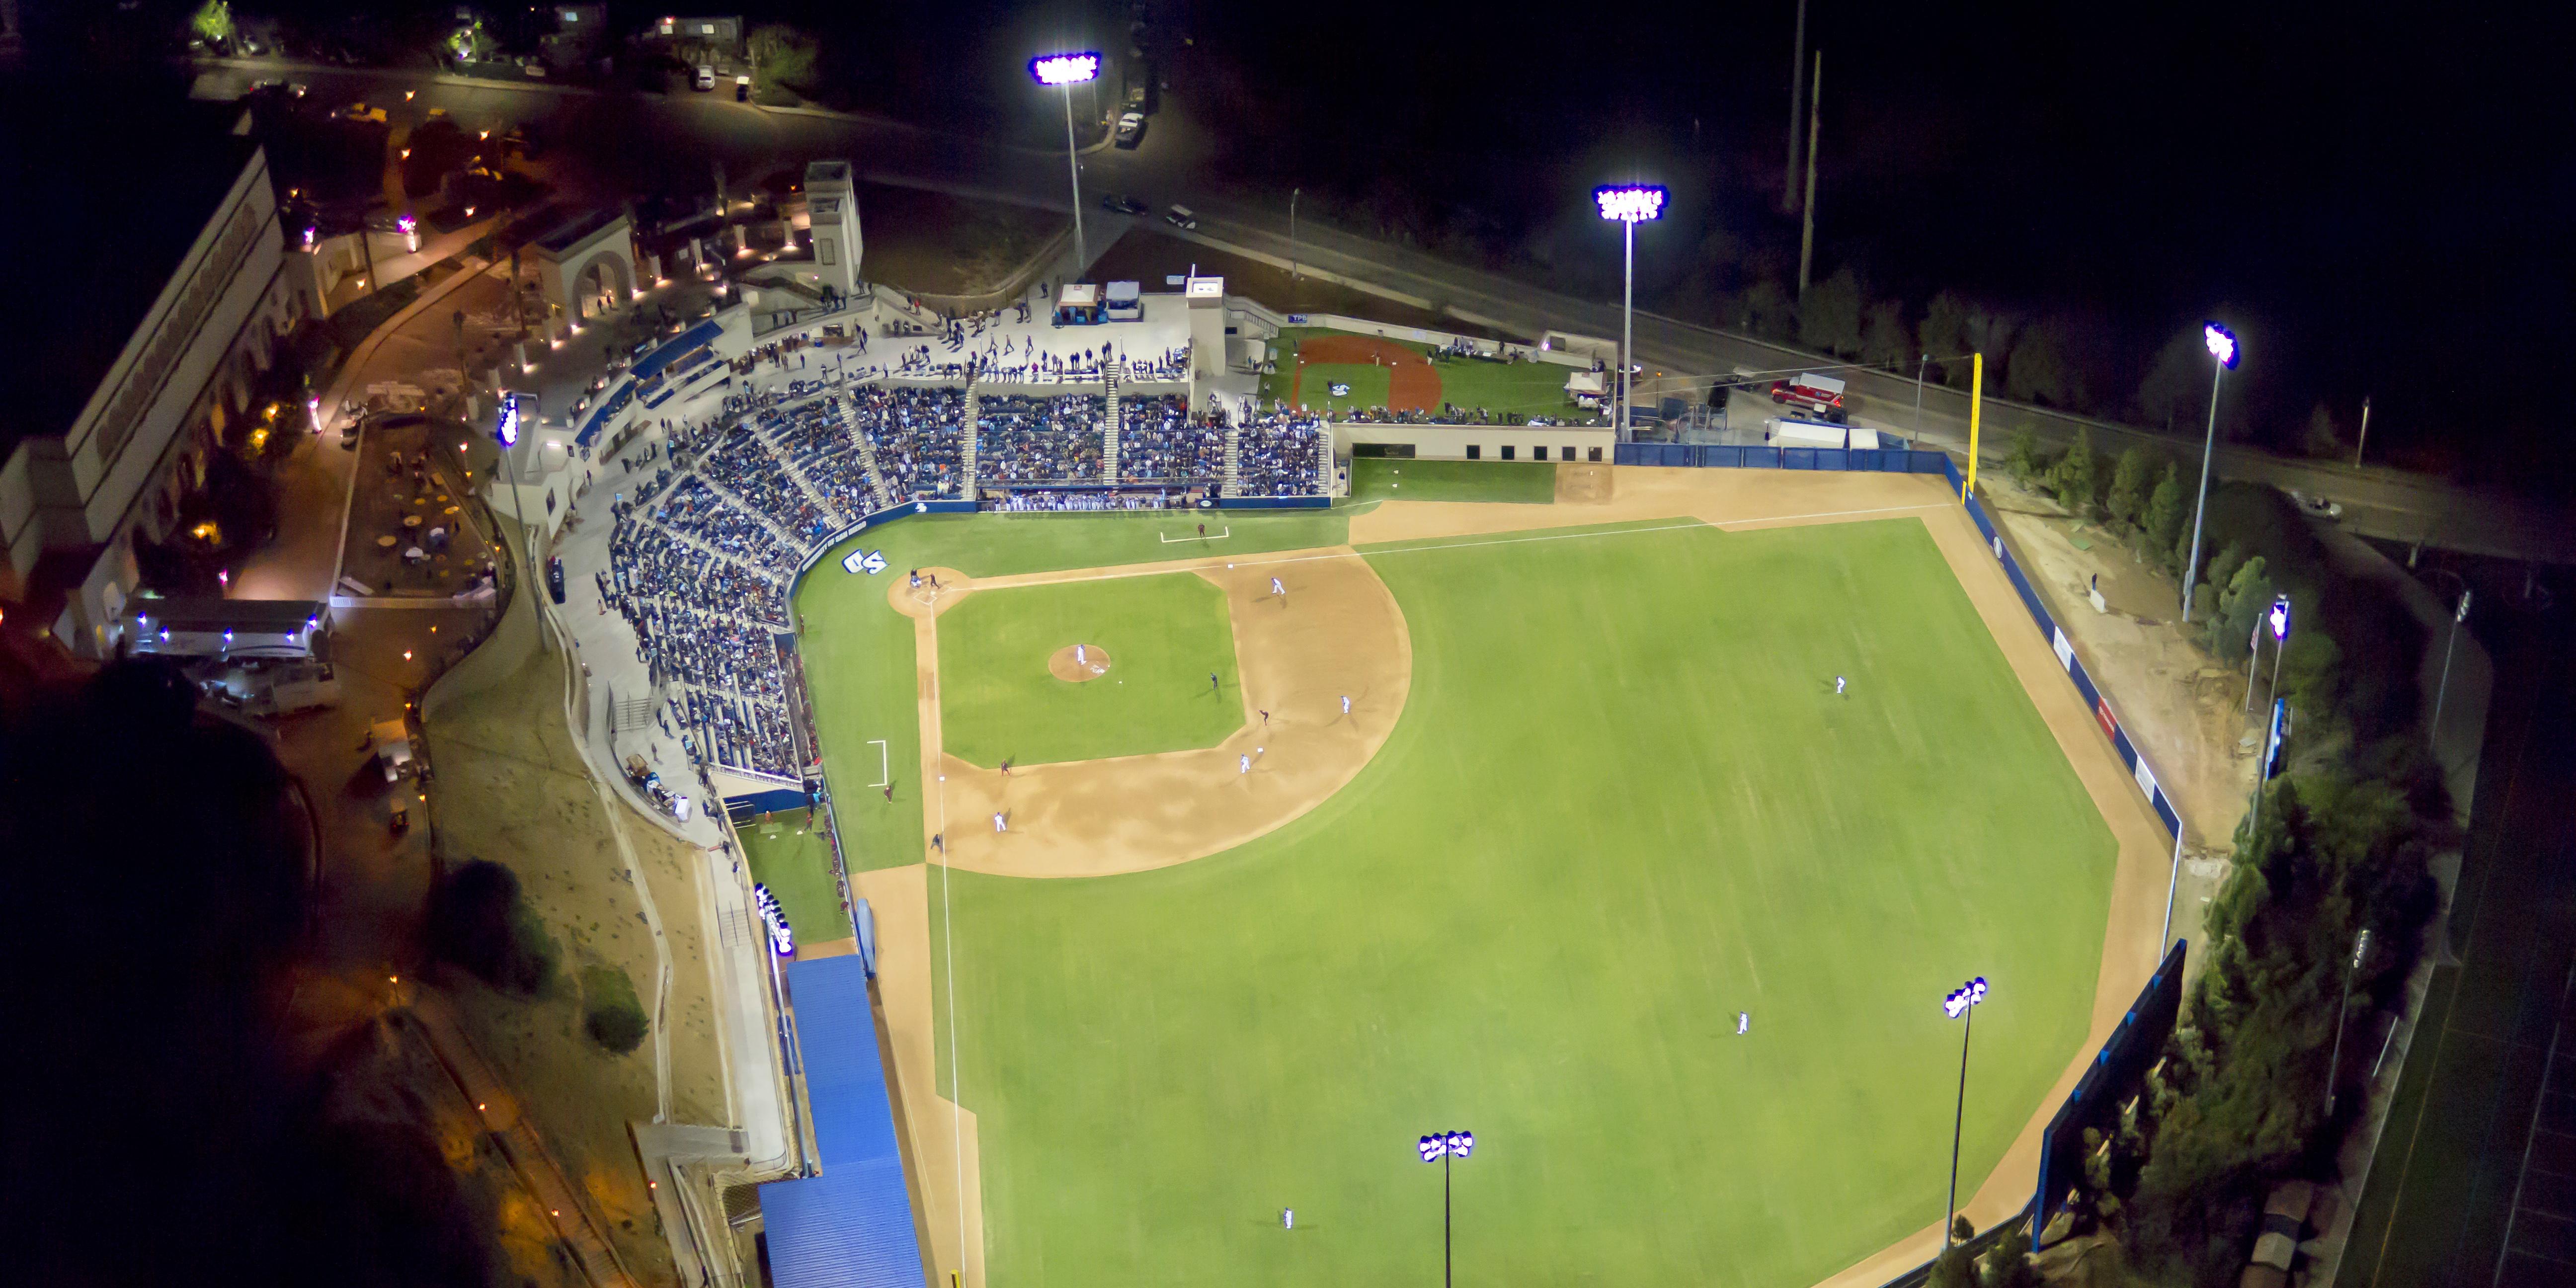 USD baseball stadium, Fowler Park